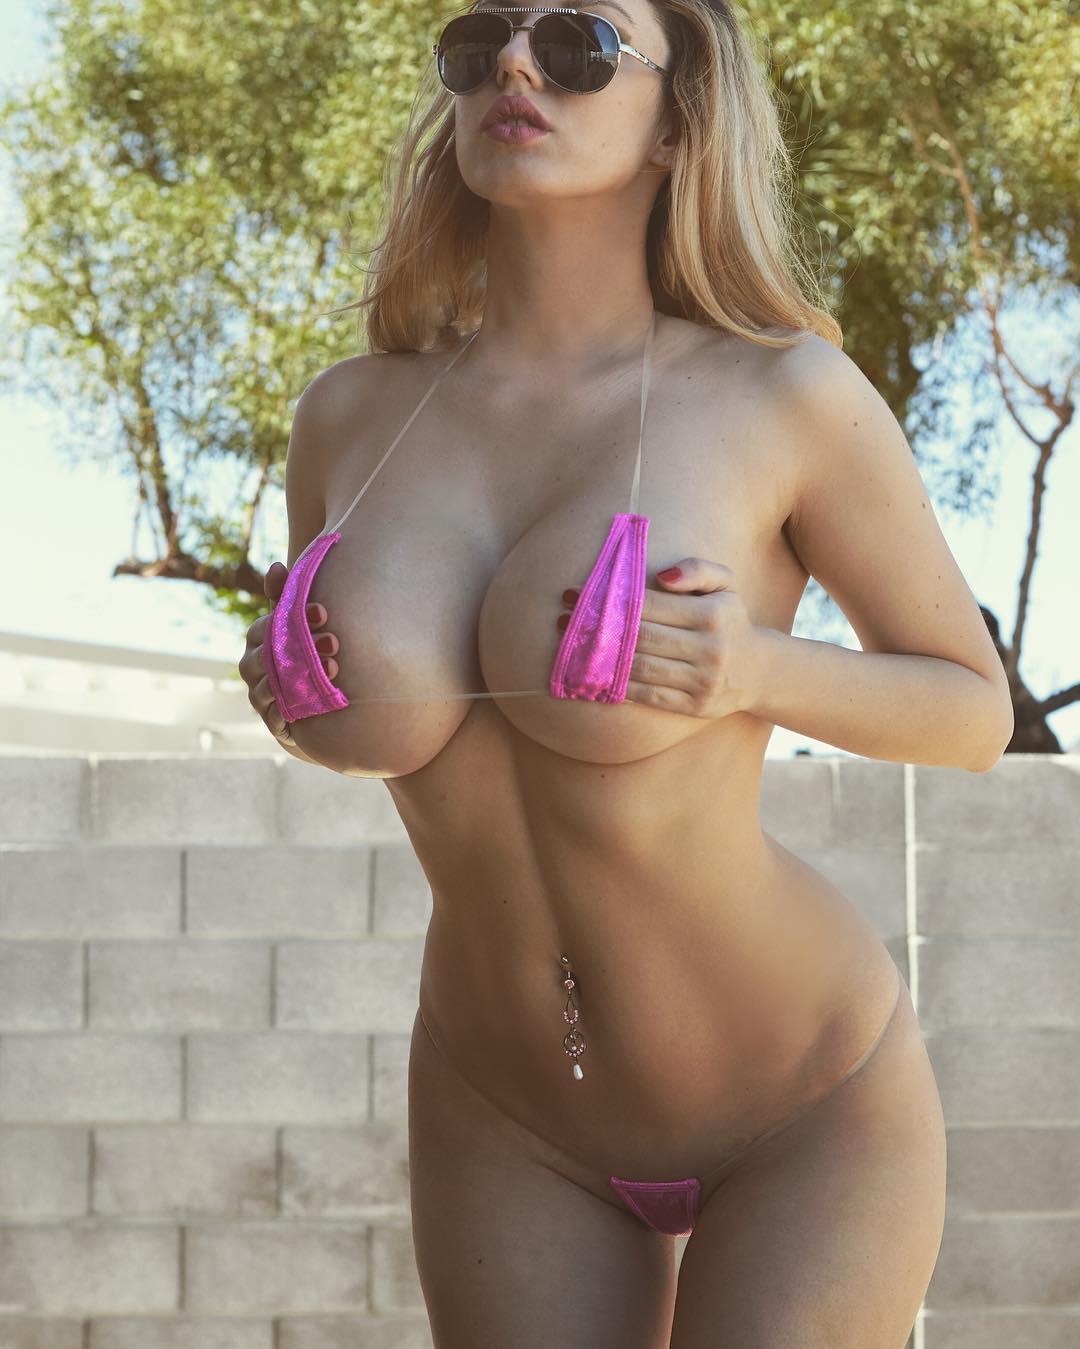 Ashley Dee Porn ashley white porn pic - eporner